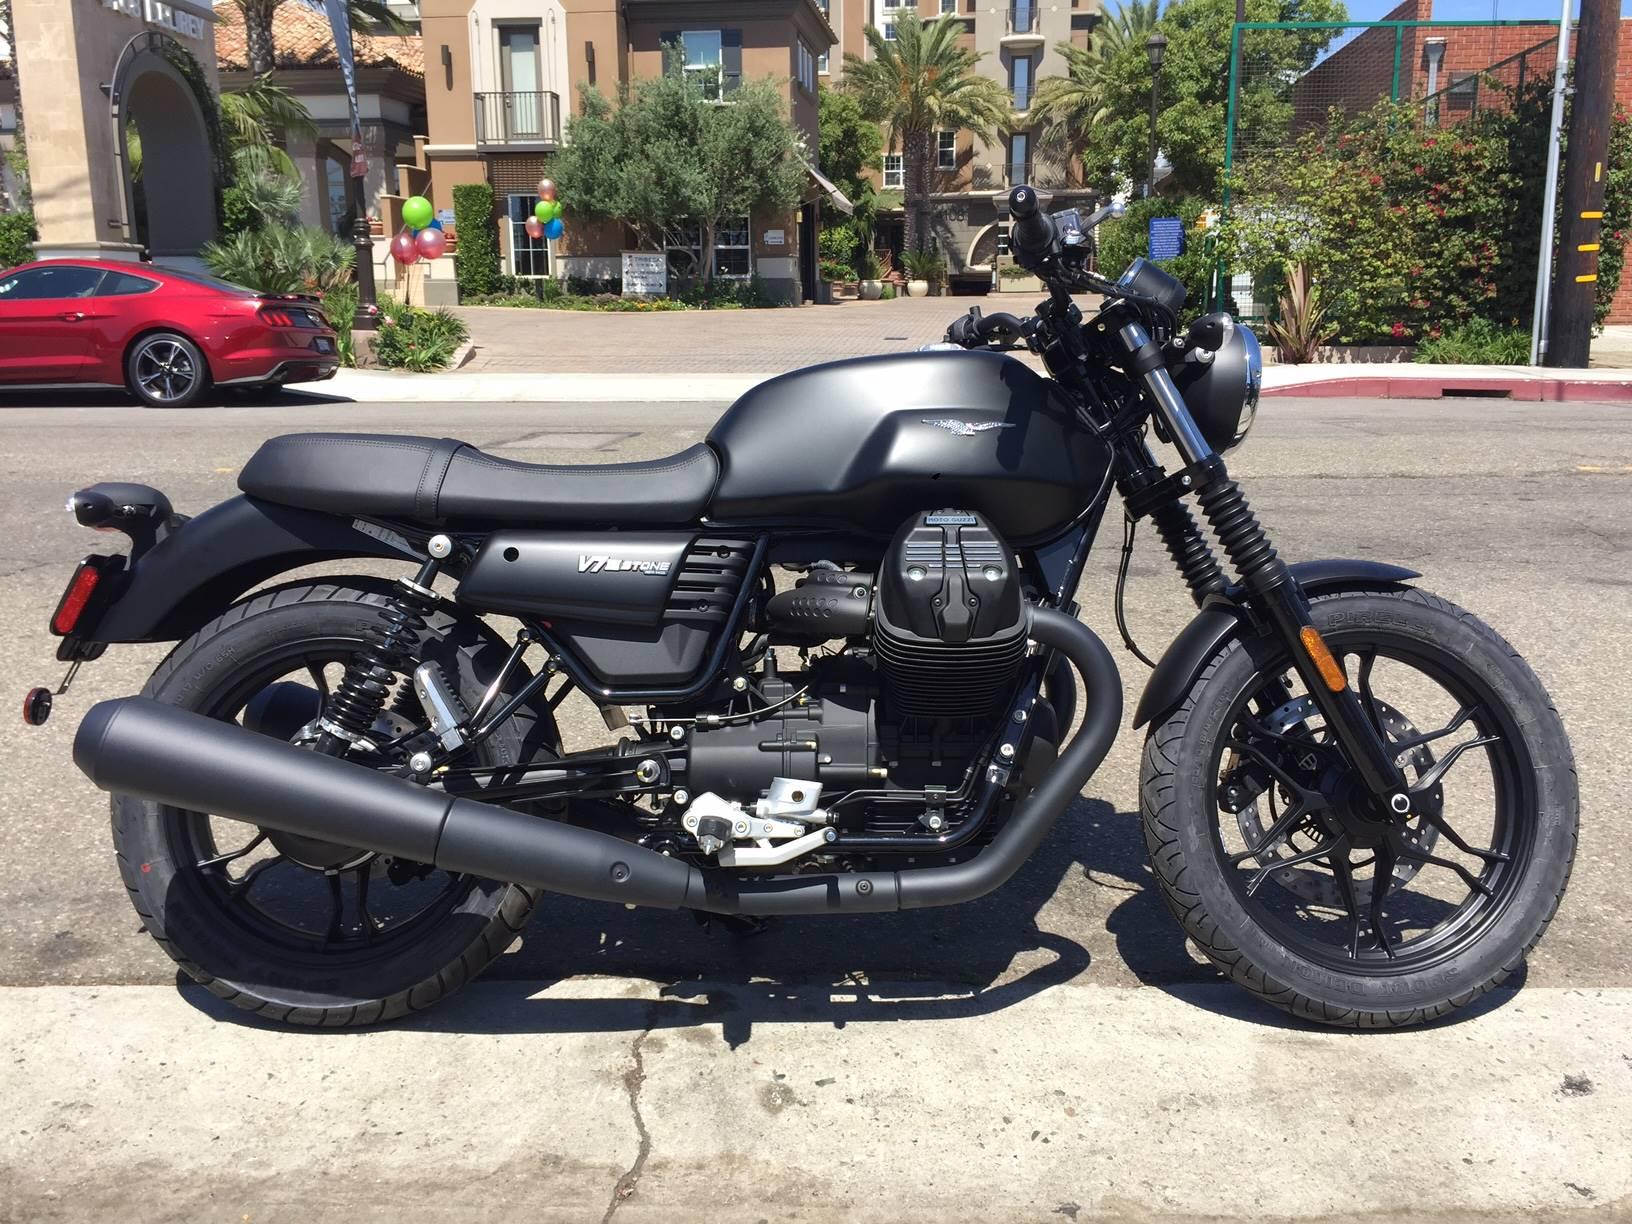 2018 moto guzzi v7 iii stone motorcycles marina del rey california. Black Bedroom Furniture Sets. Home Design Ideas